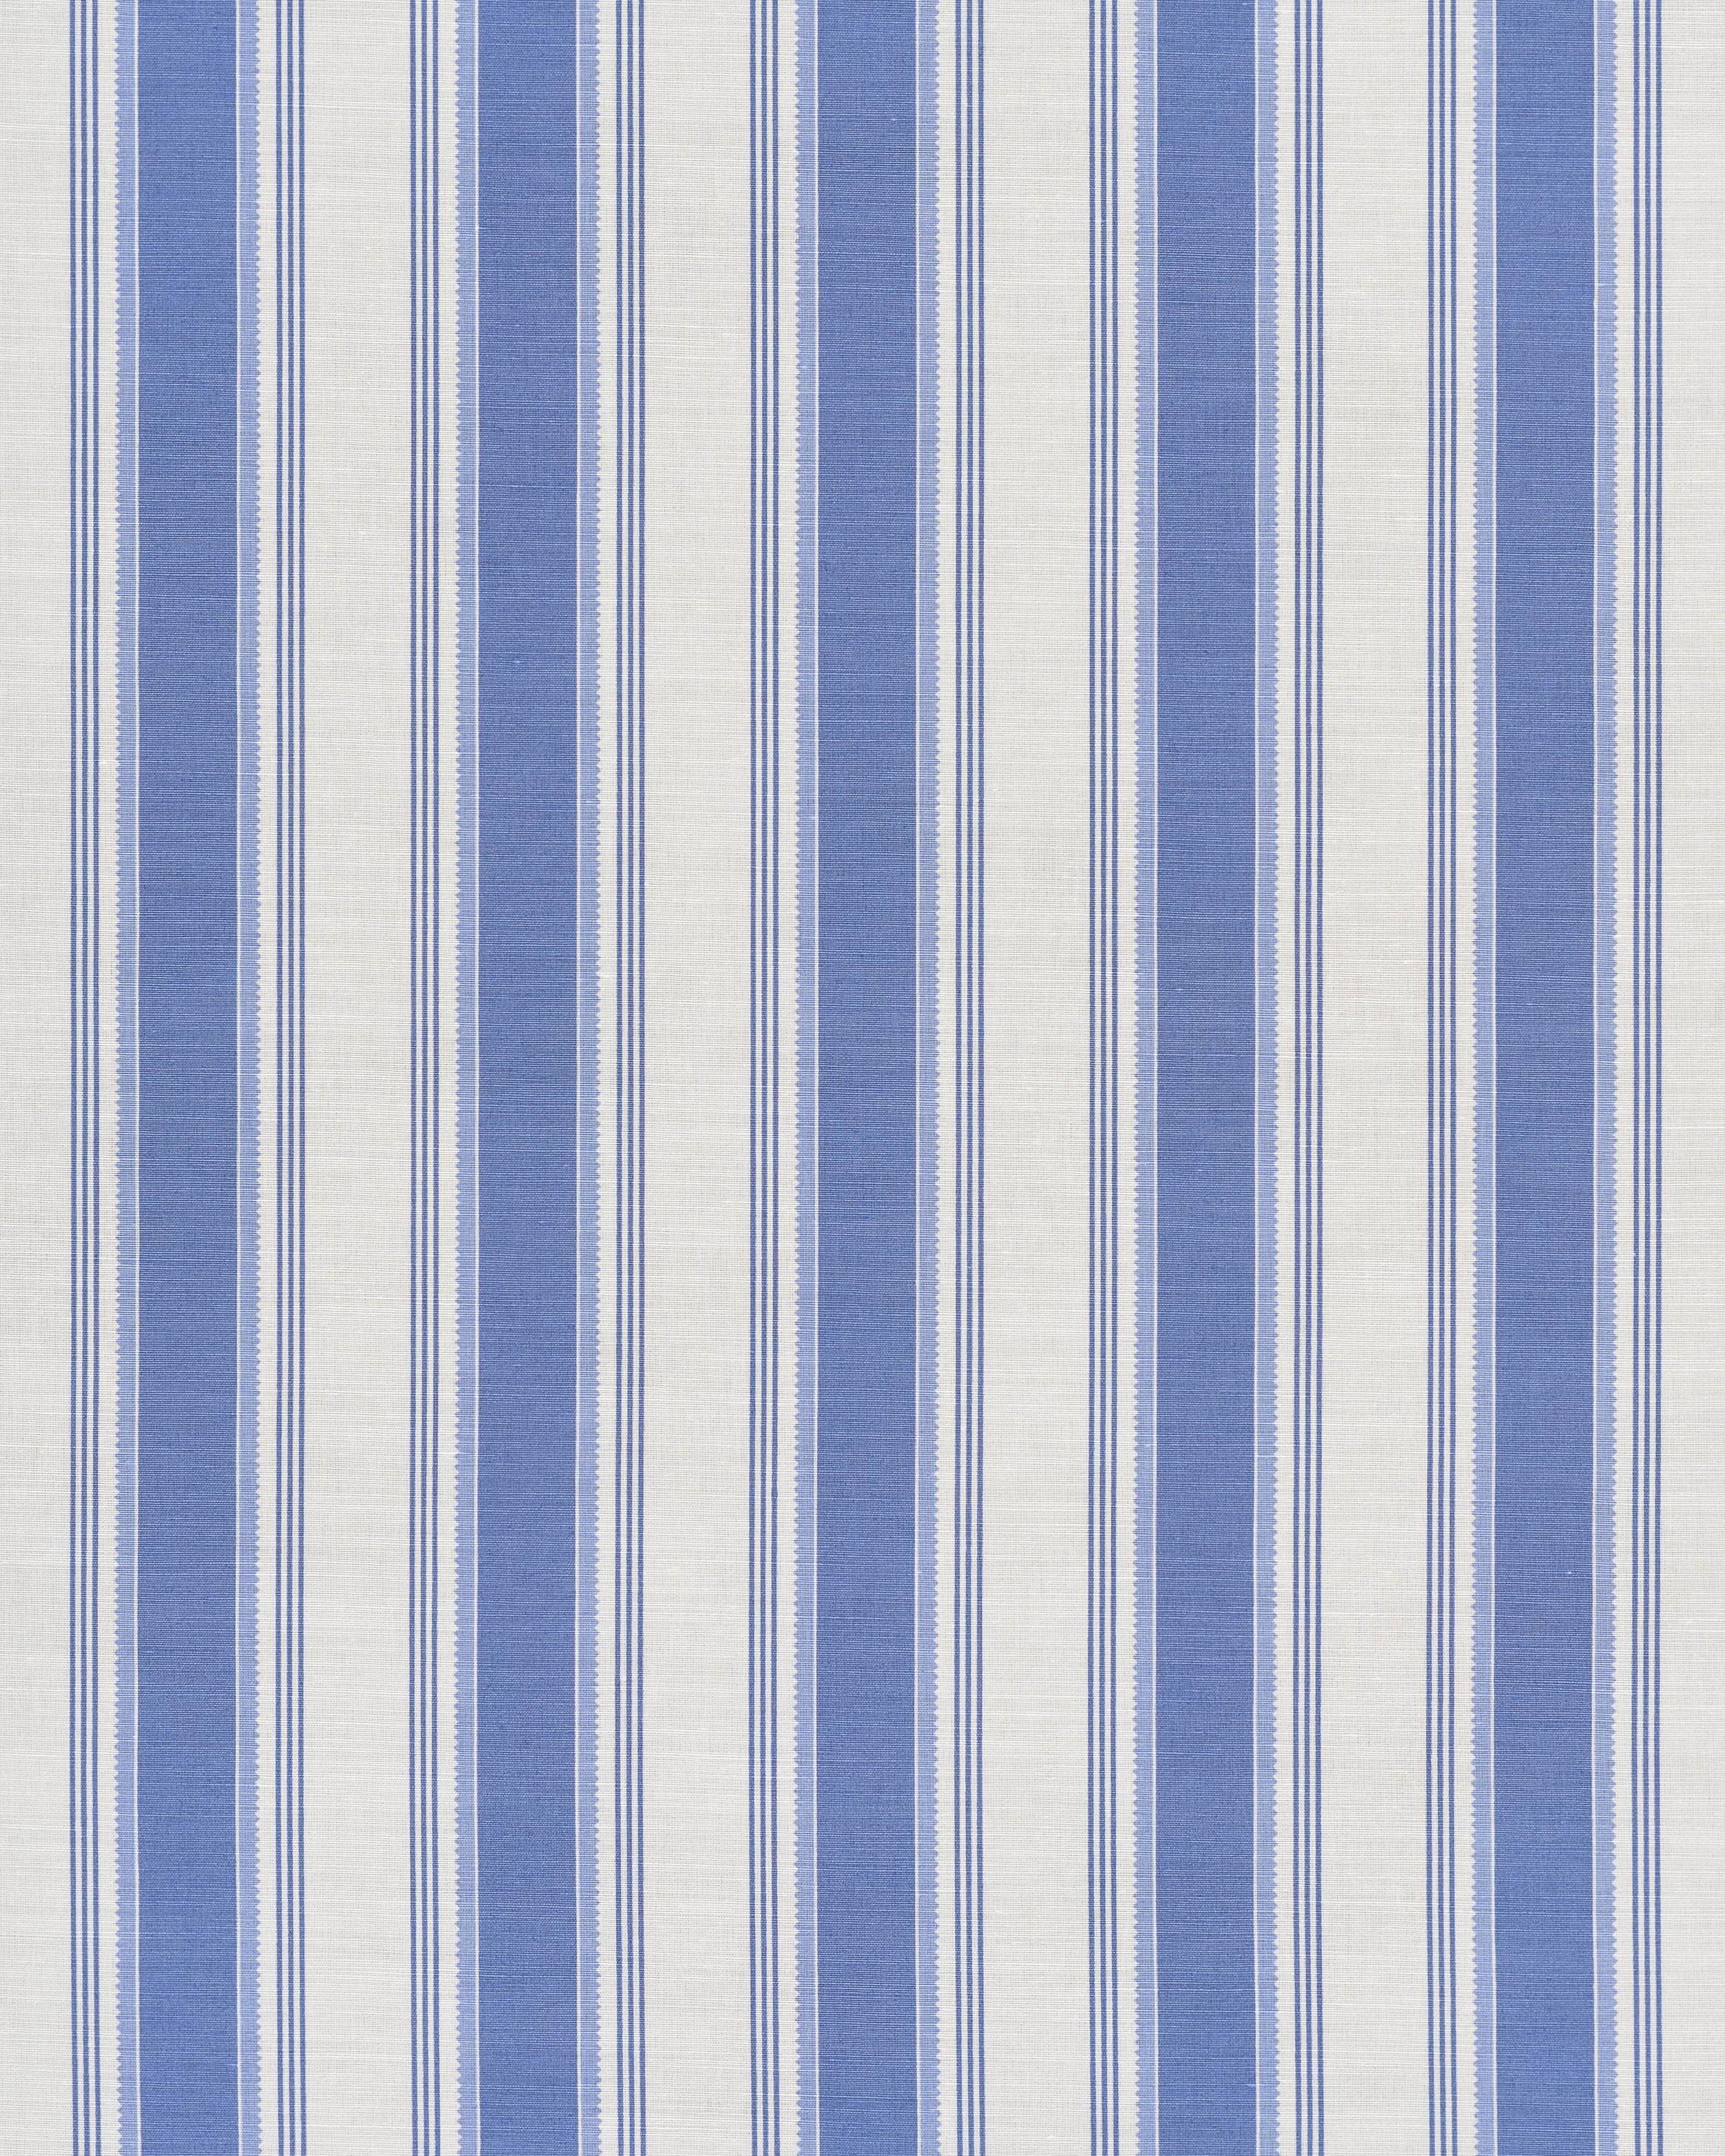 Pavilion Stripe Mid Blue on Oyster Boy's room, Fabric